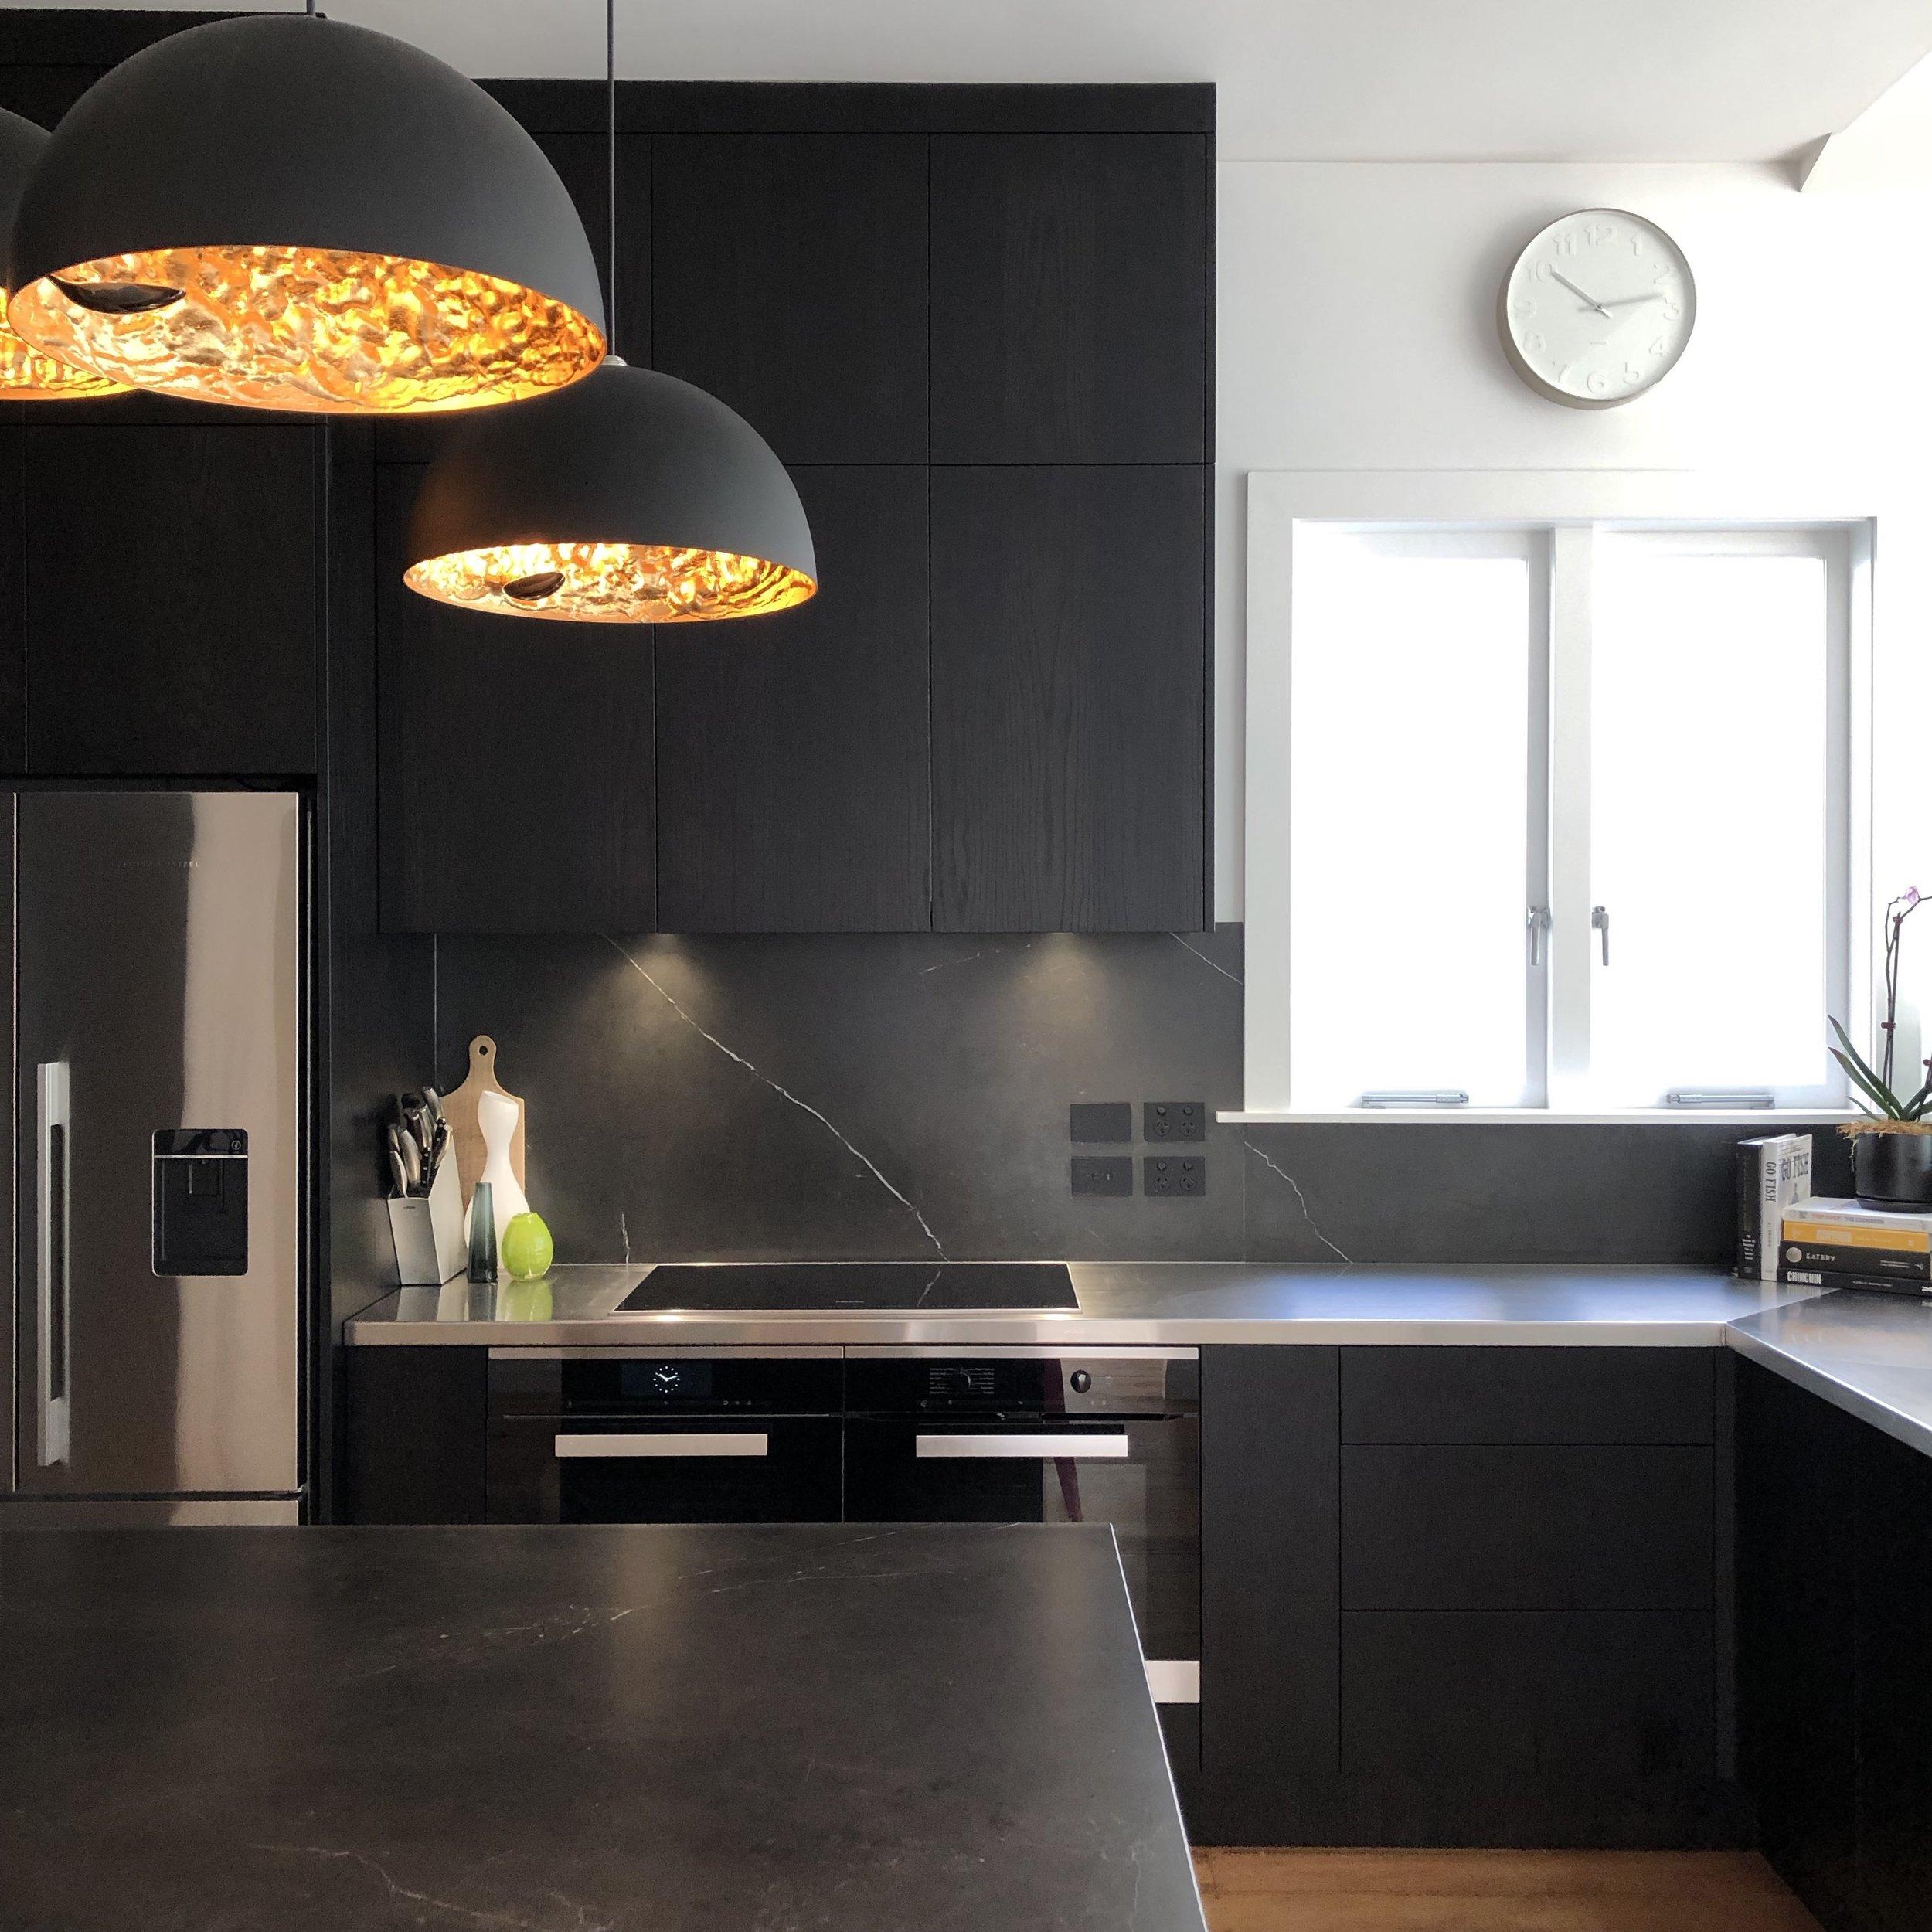 kitchendesign.jpg